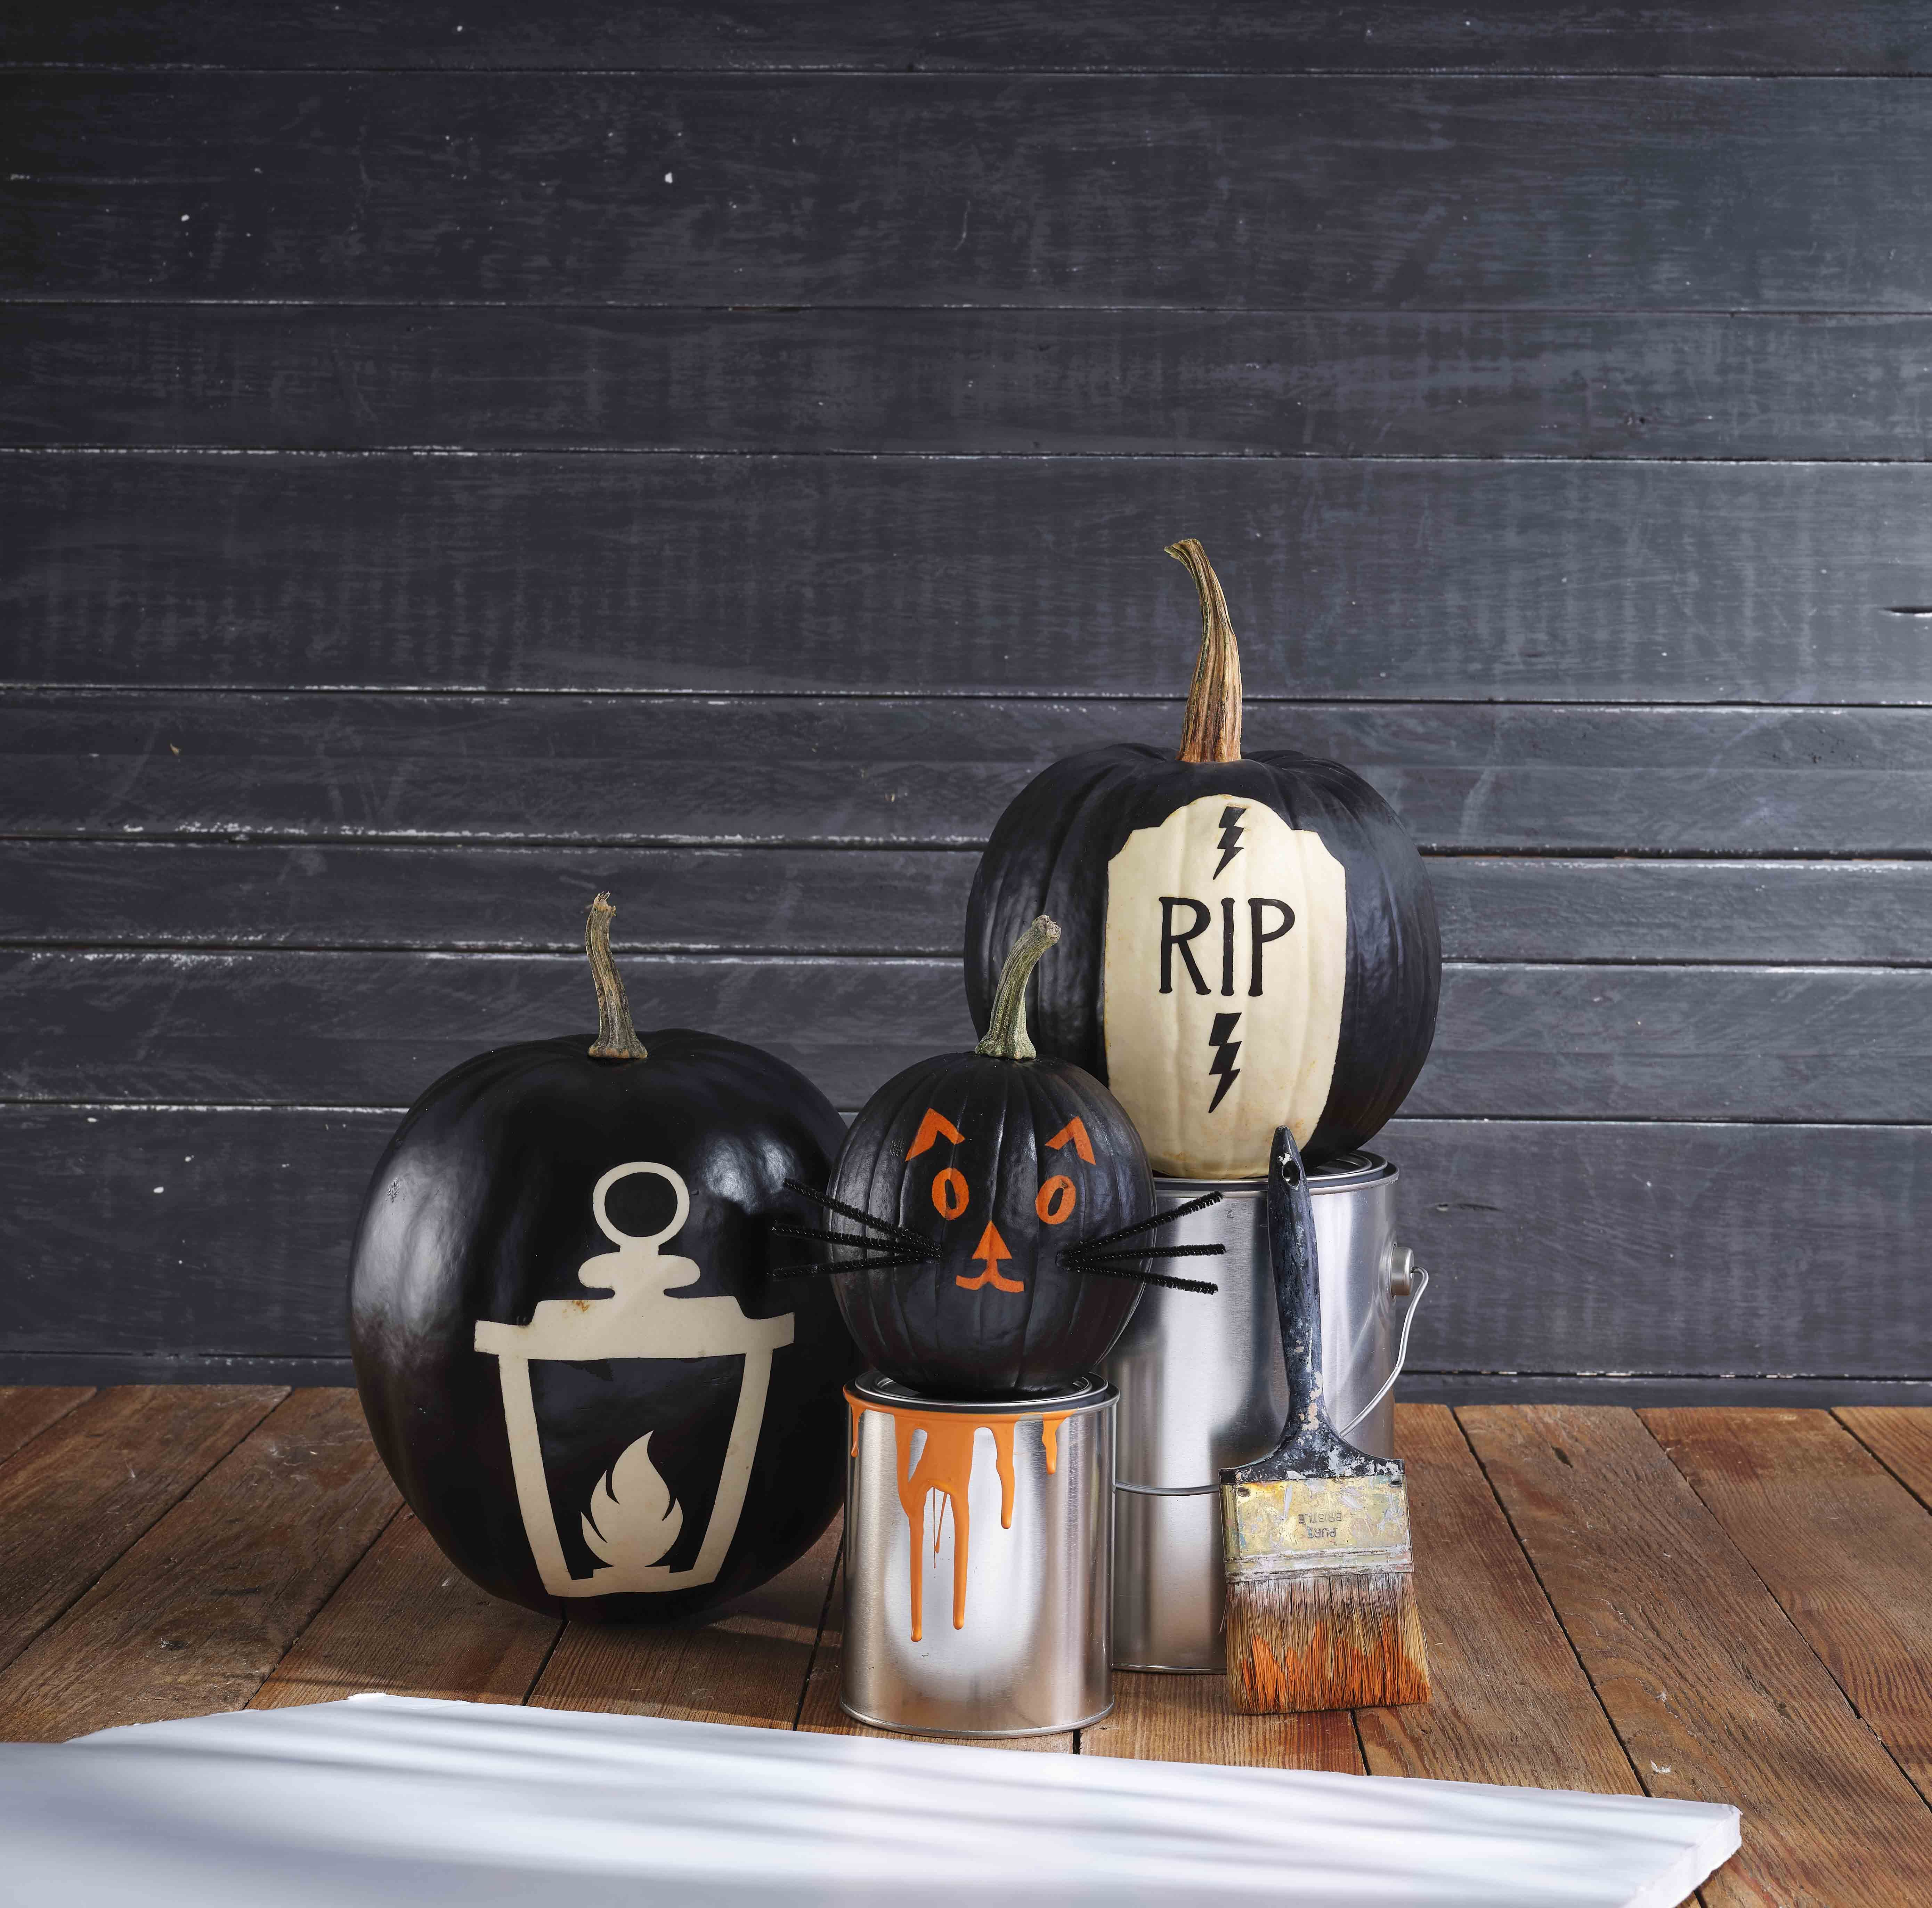 65 Easy Painted Pumpkins Ideas No Carve Halloween Pumpkin Painting Decorating Ideas